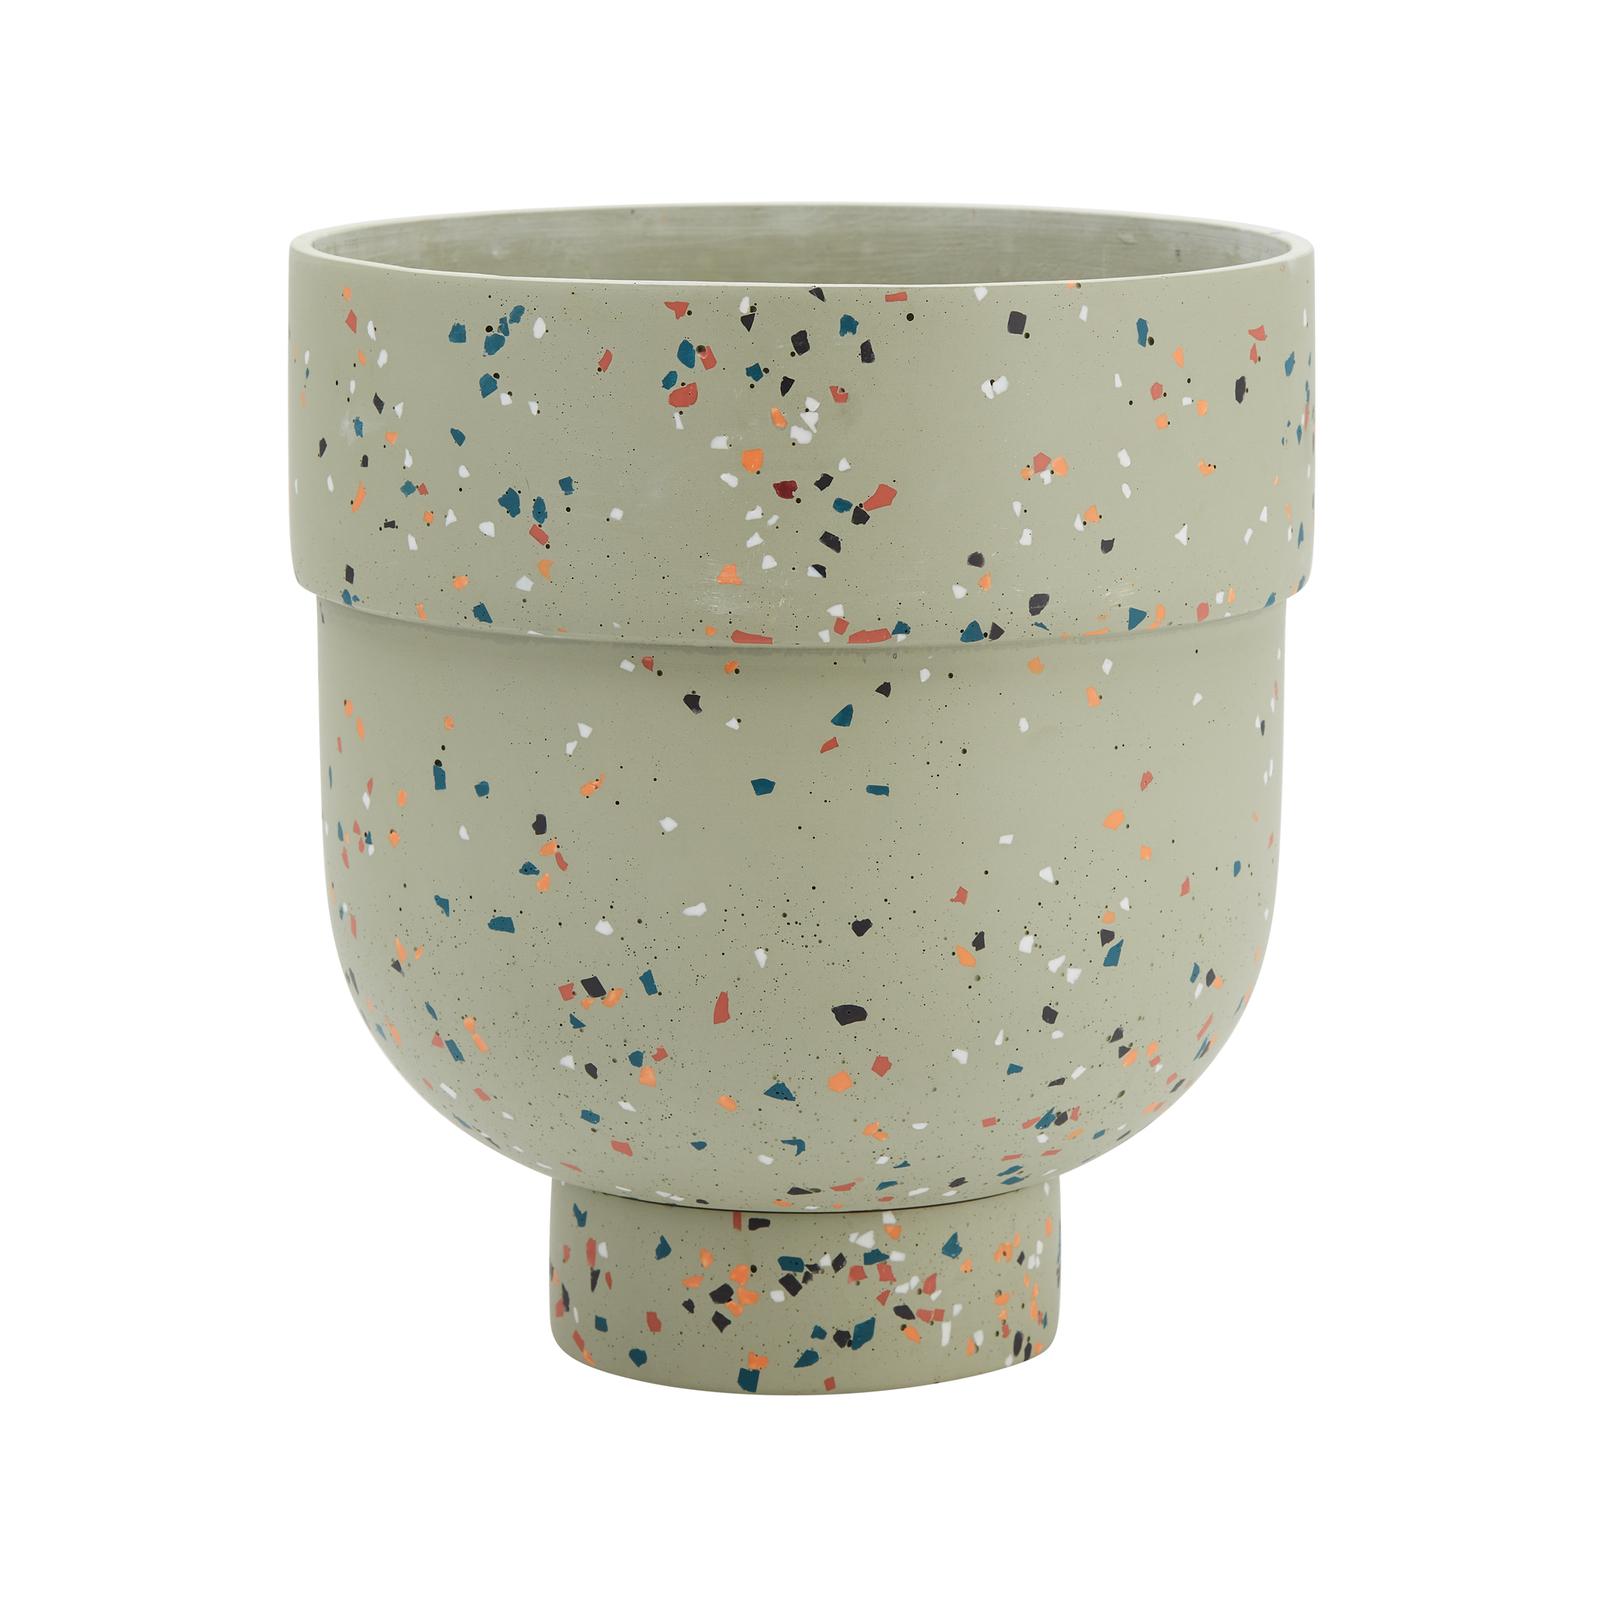 Capra 22.2 x 24.6cm Gum Leaf Funnel Terrazzo Resin Pot